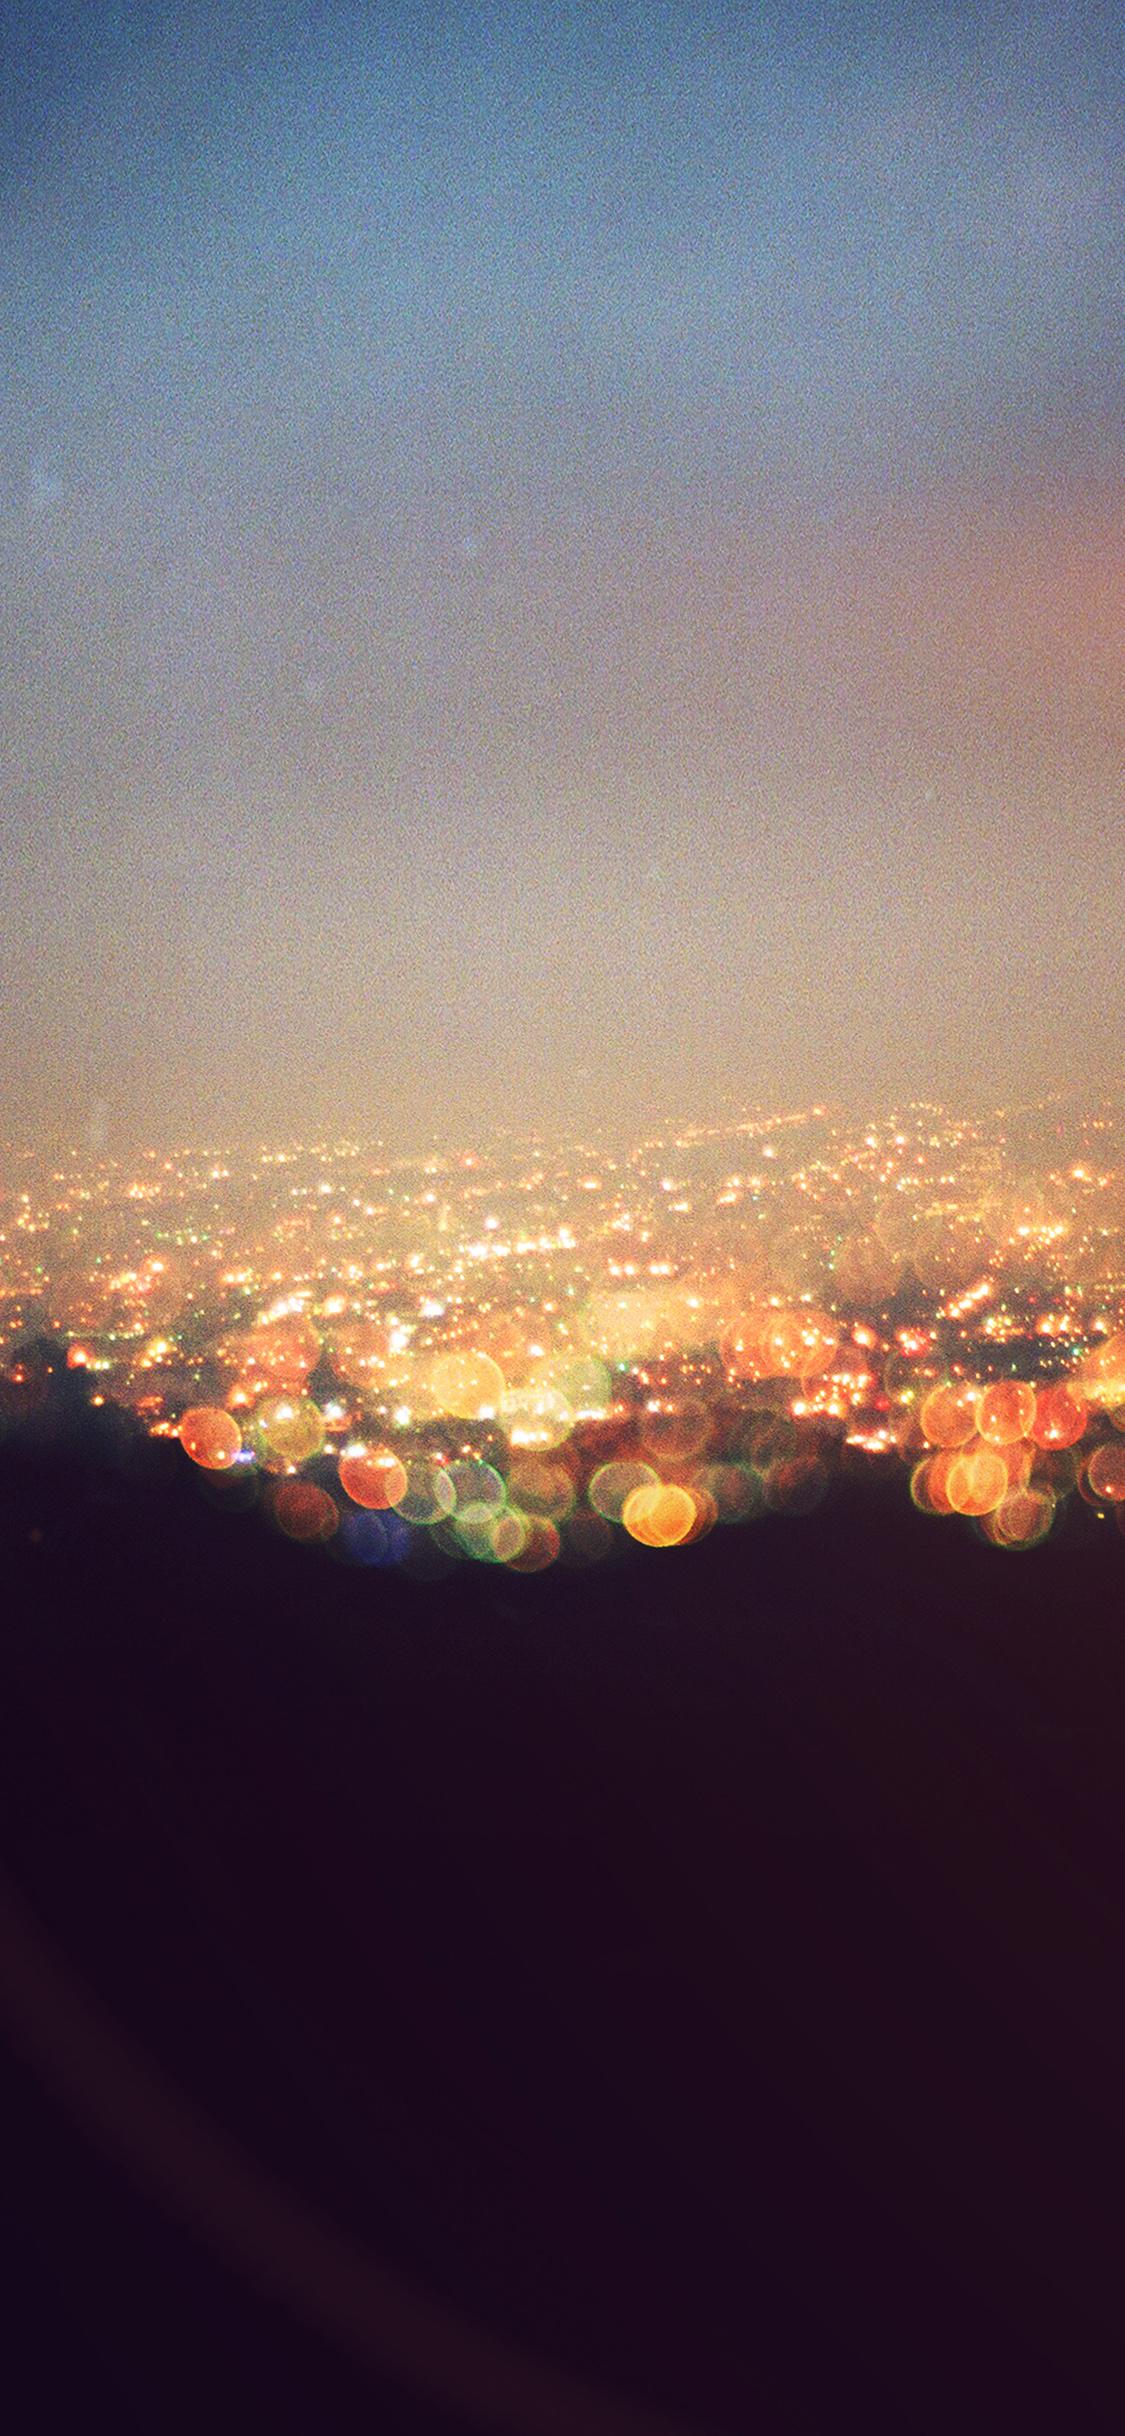 iPhoneXpapers.com-Apple-iPhone-wallpaper-mq72-bokeh-night-city-view-lights-flare